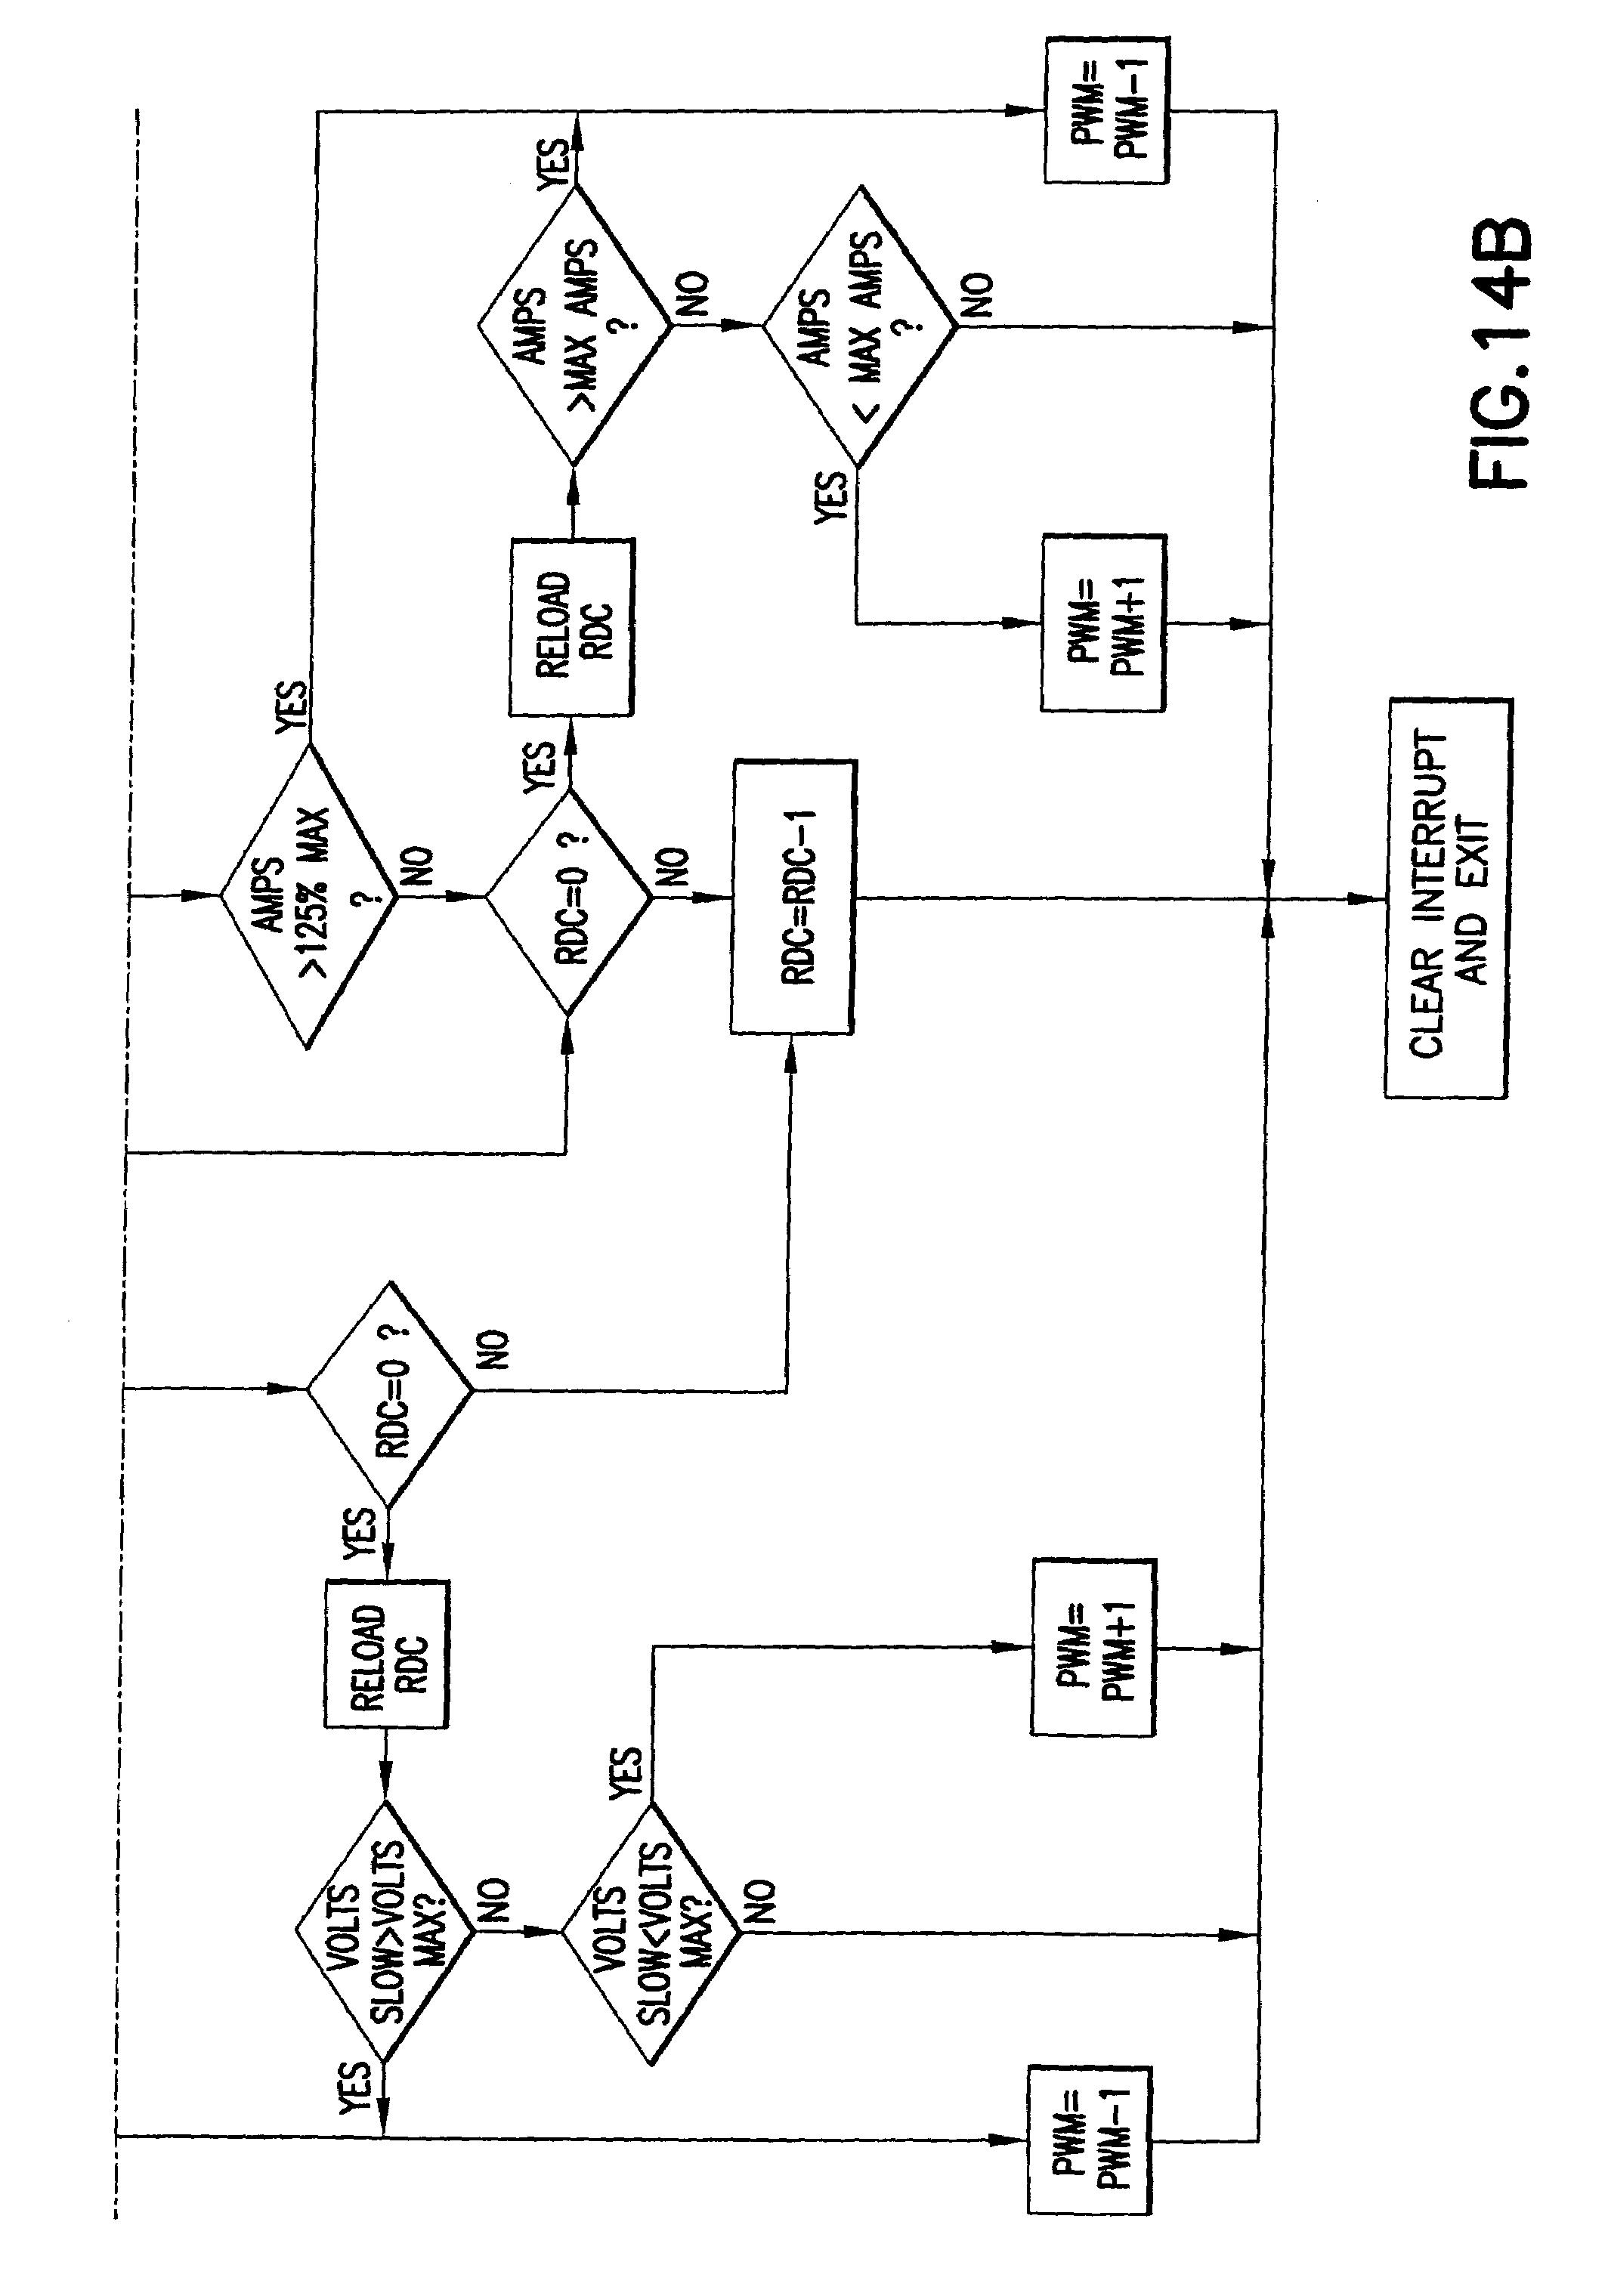 1984 ez go engine diagram html